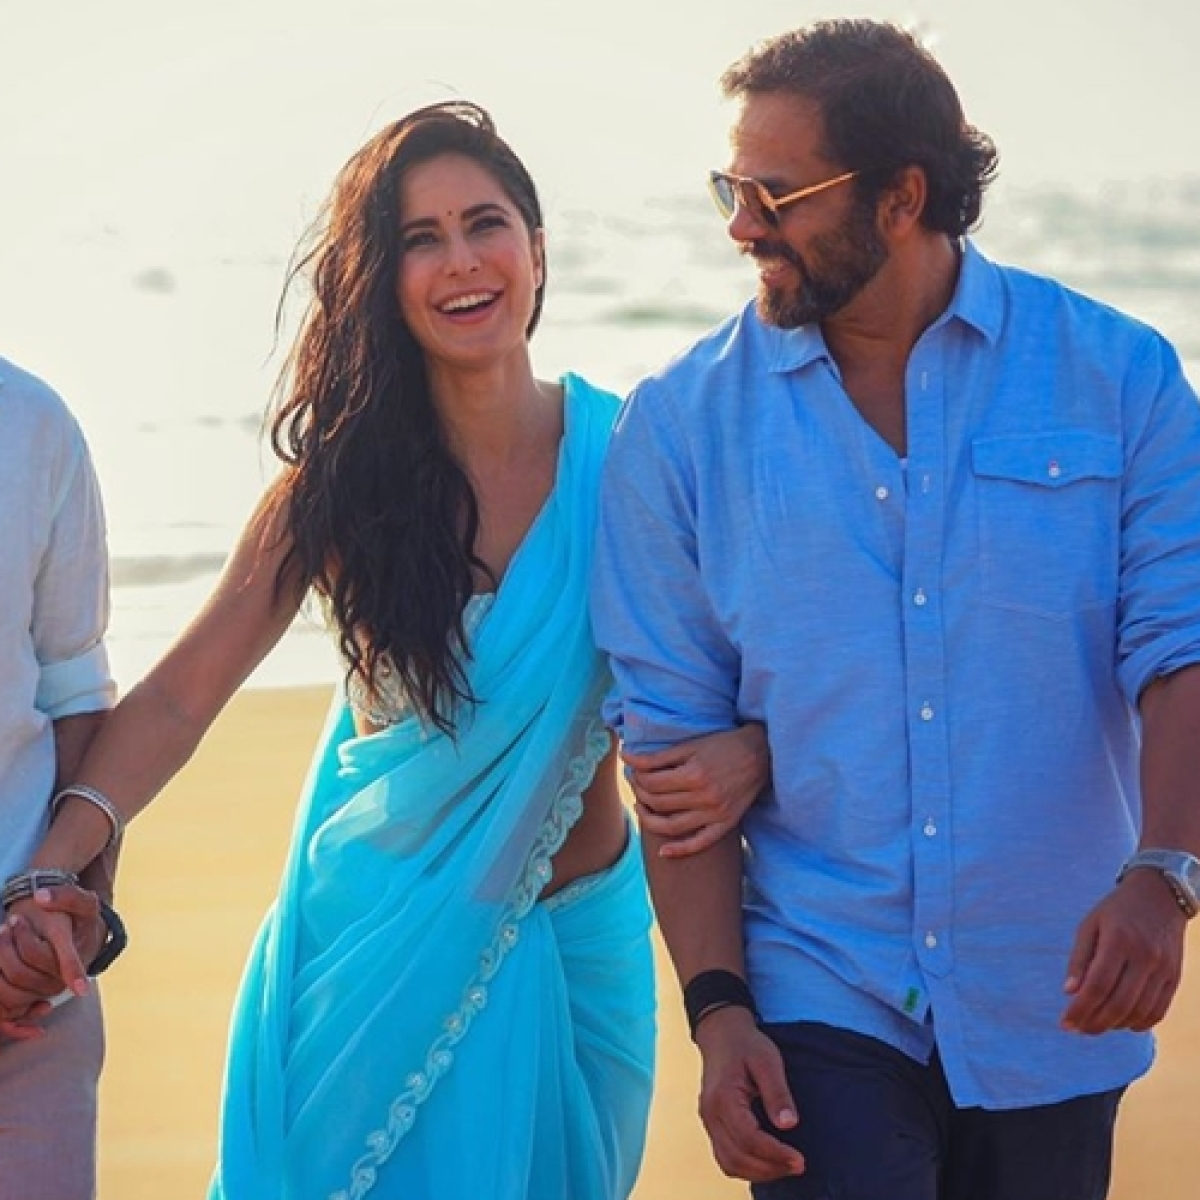 Sooryavanshi: Katrina enjoys beach time in blue saree with Akshay Kumar and Rohit Shetty